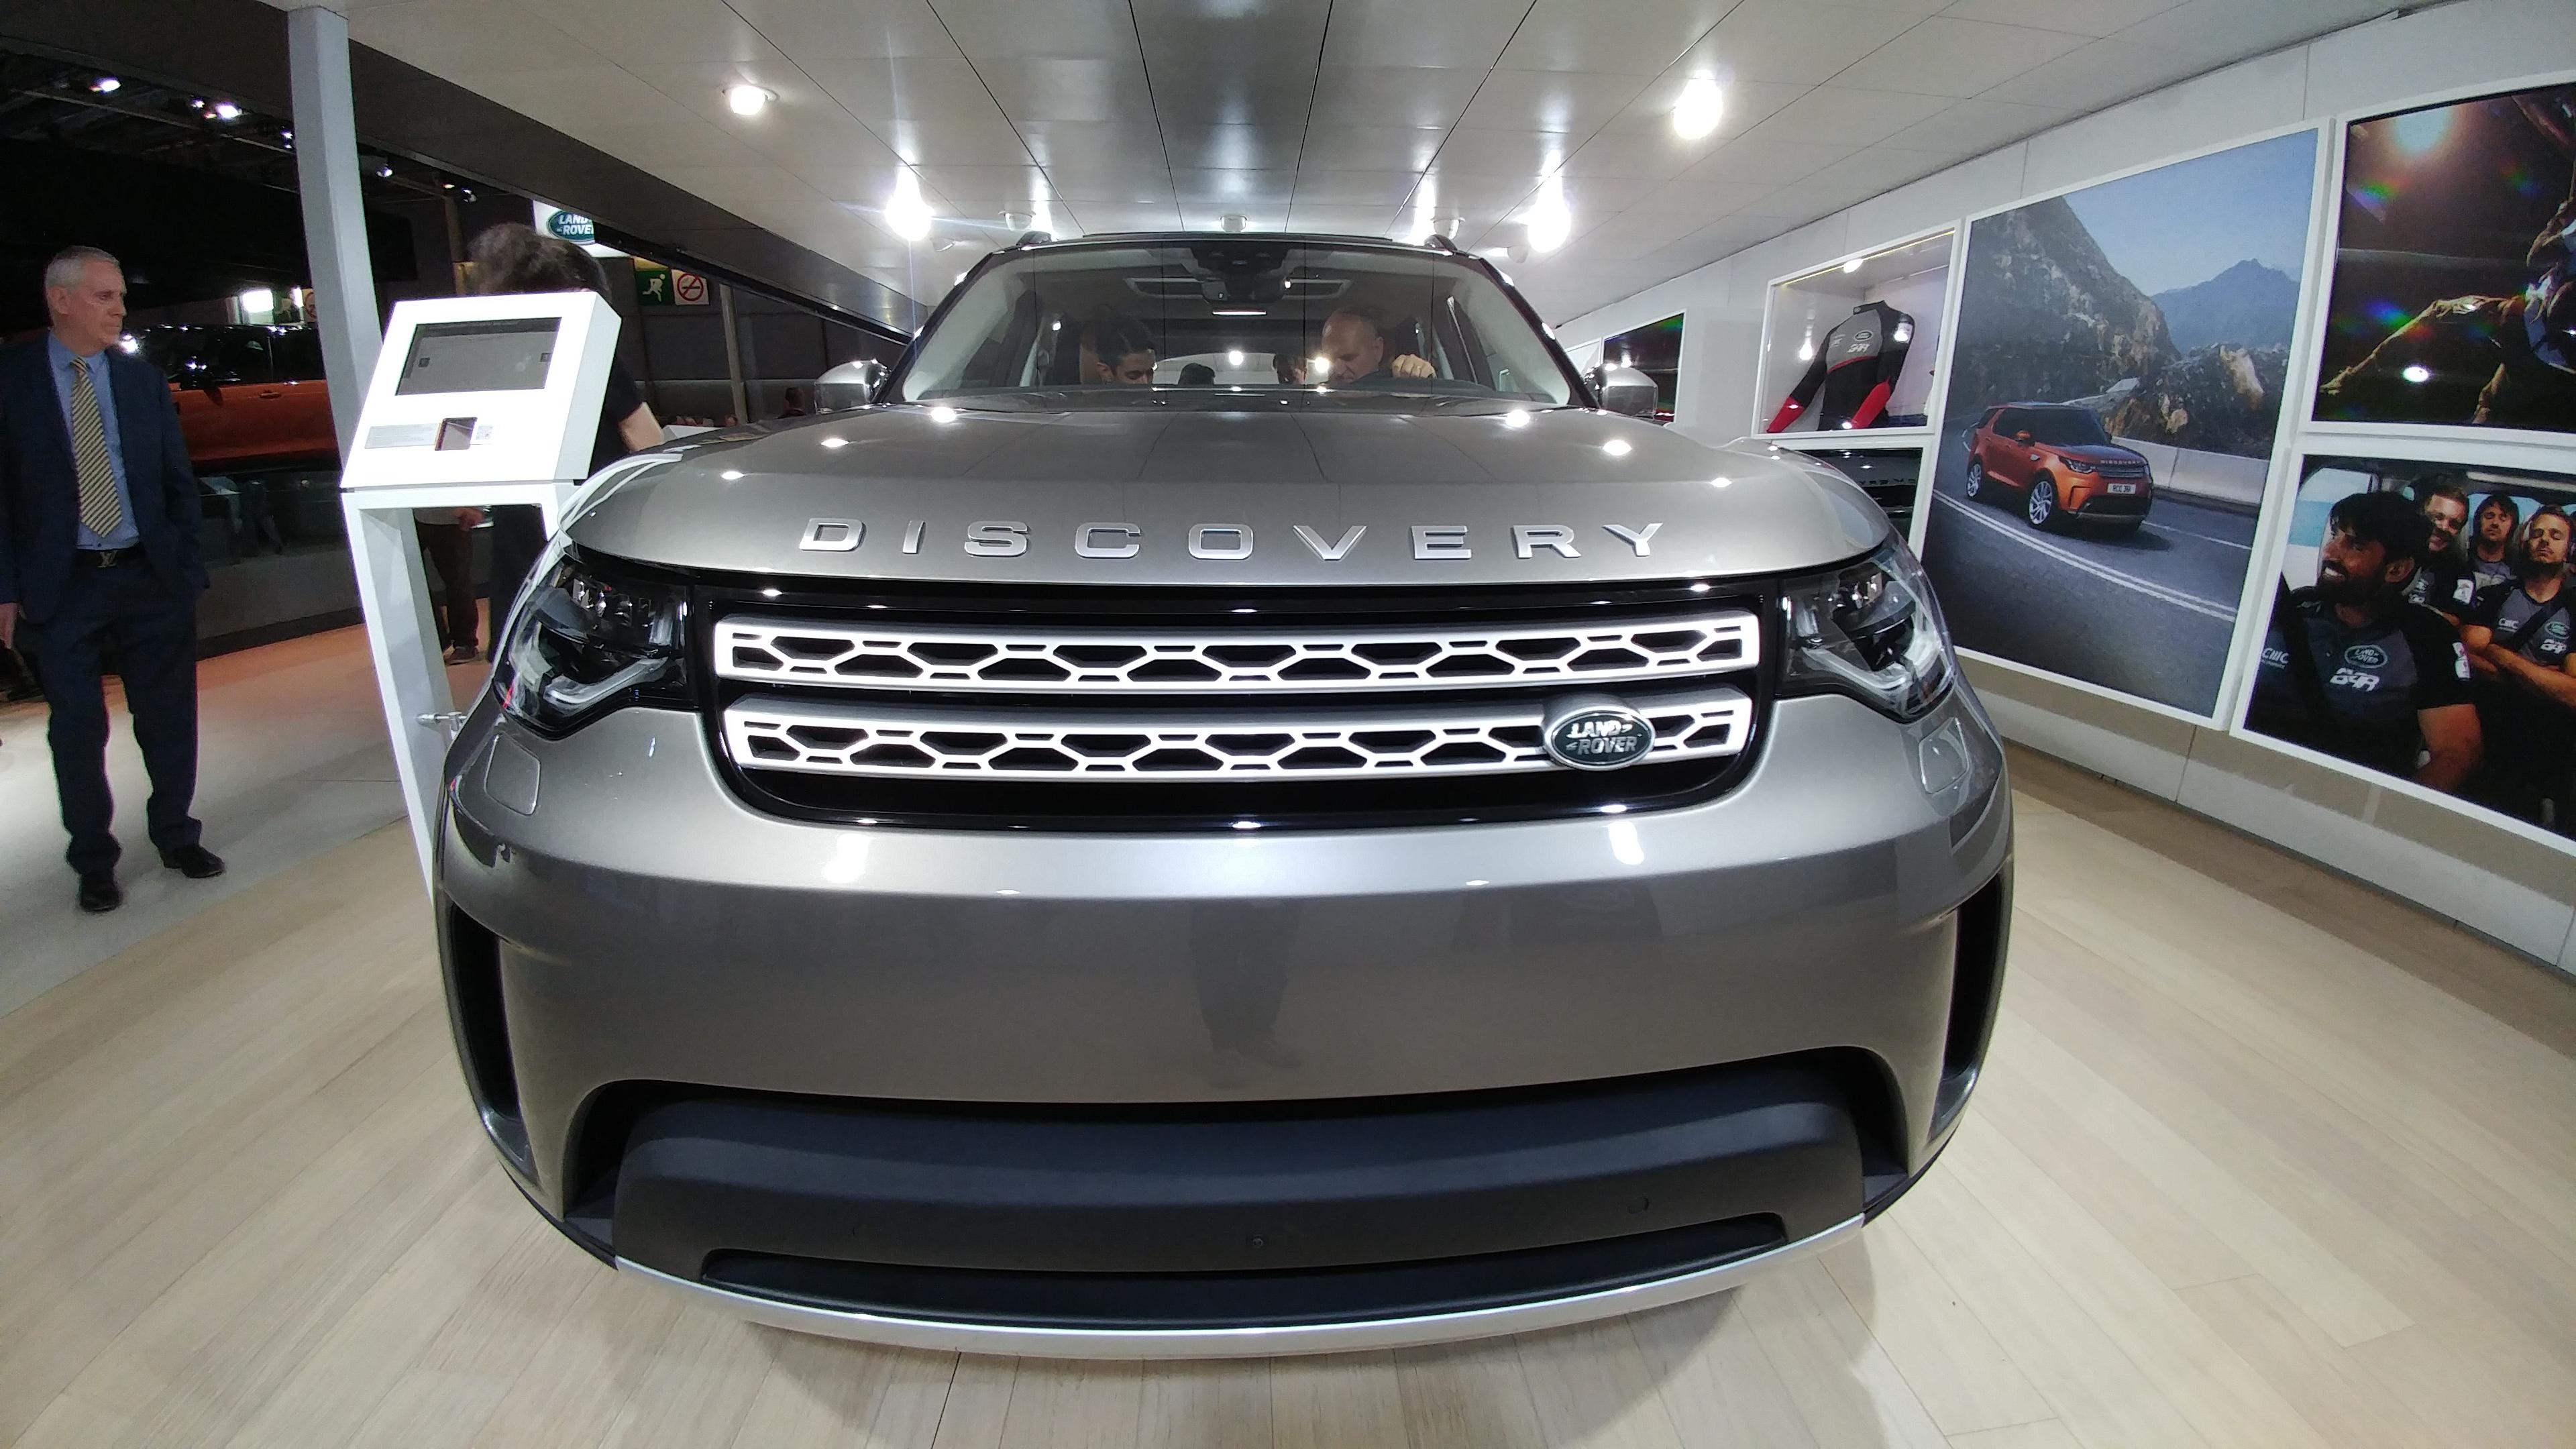 land_rover_discovery_cavaleria_20160929_163912